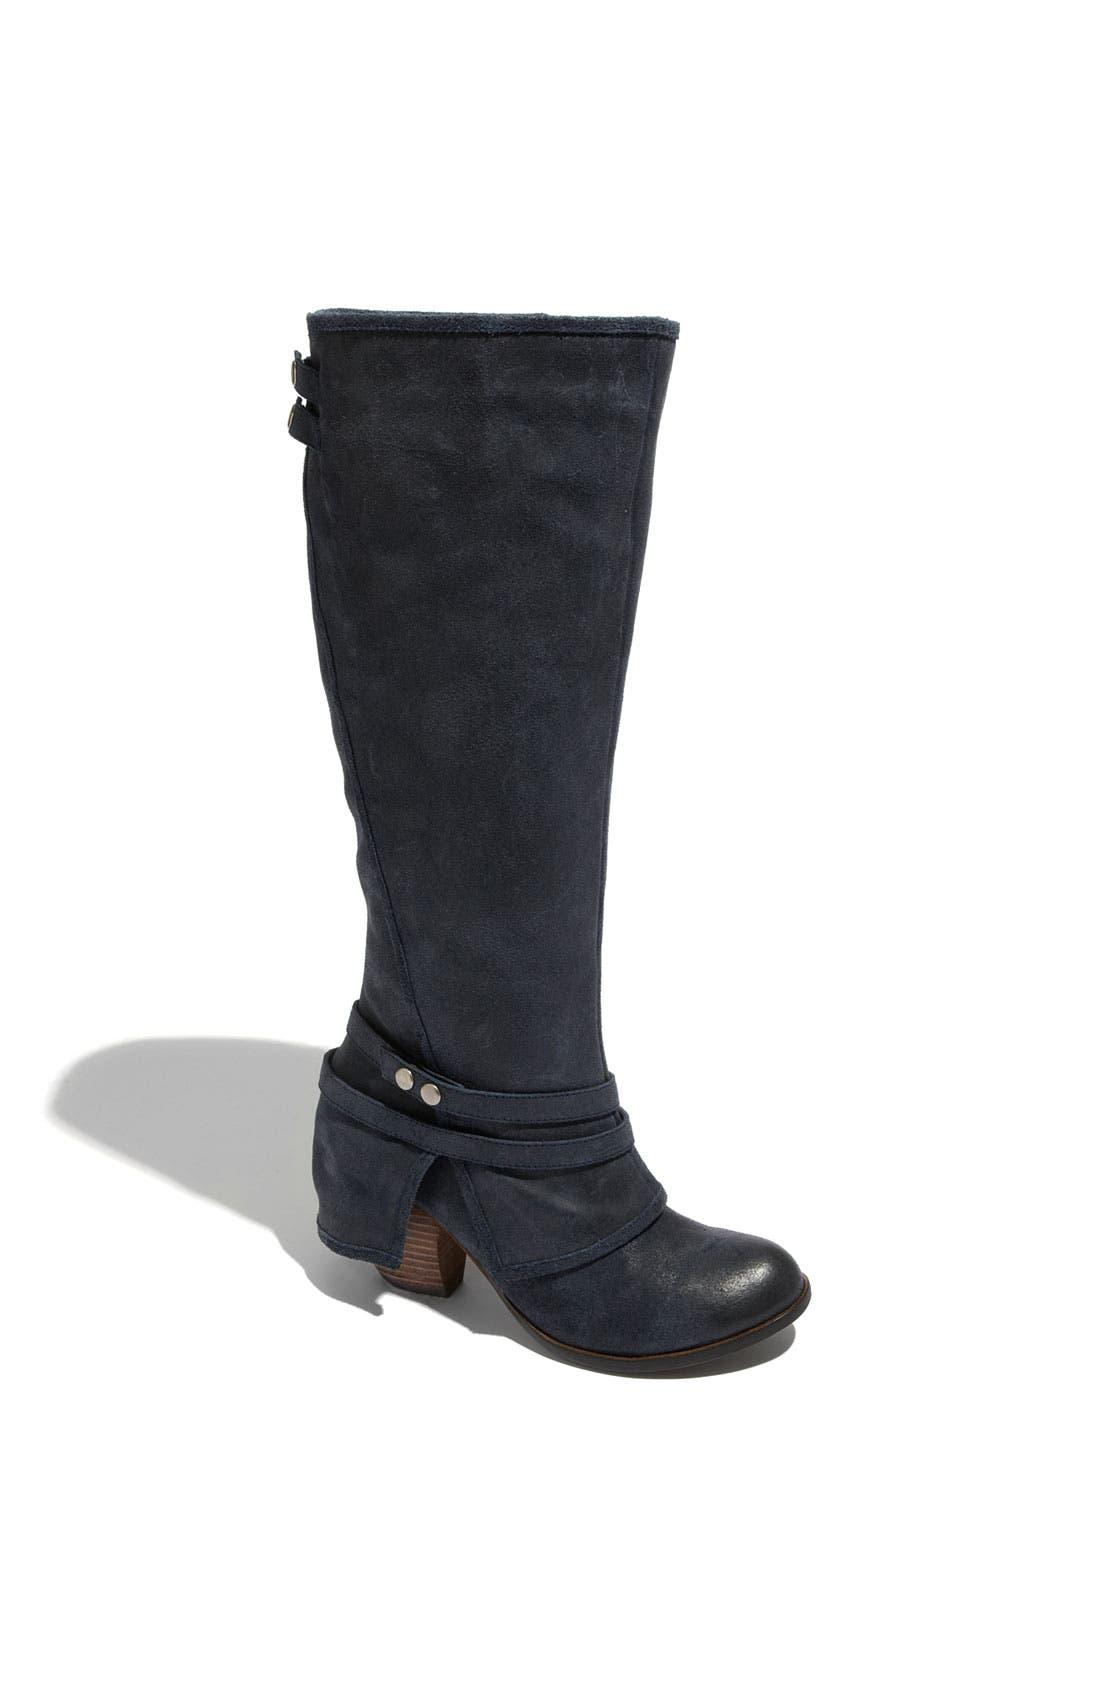 Main Image - Fergie 'Lattitude' Boot